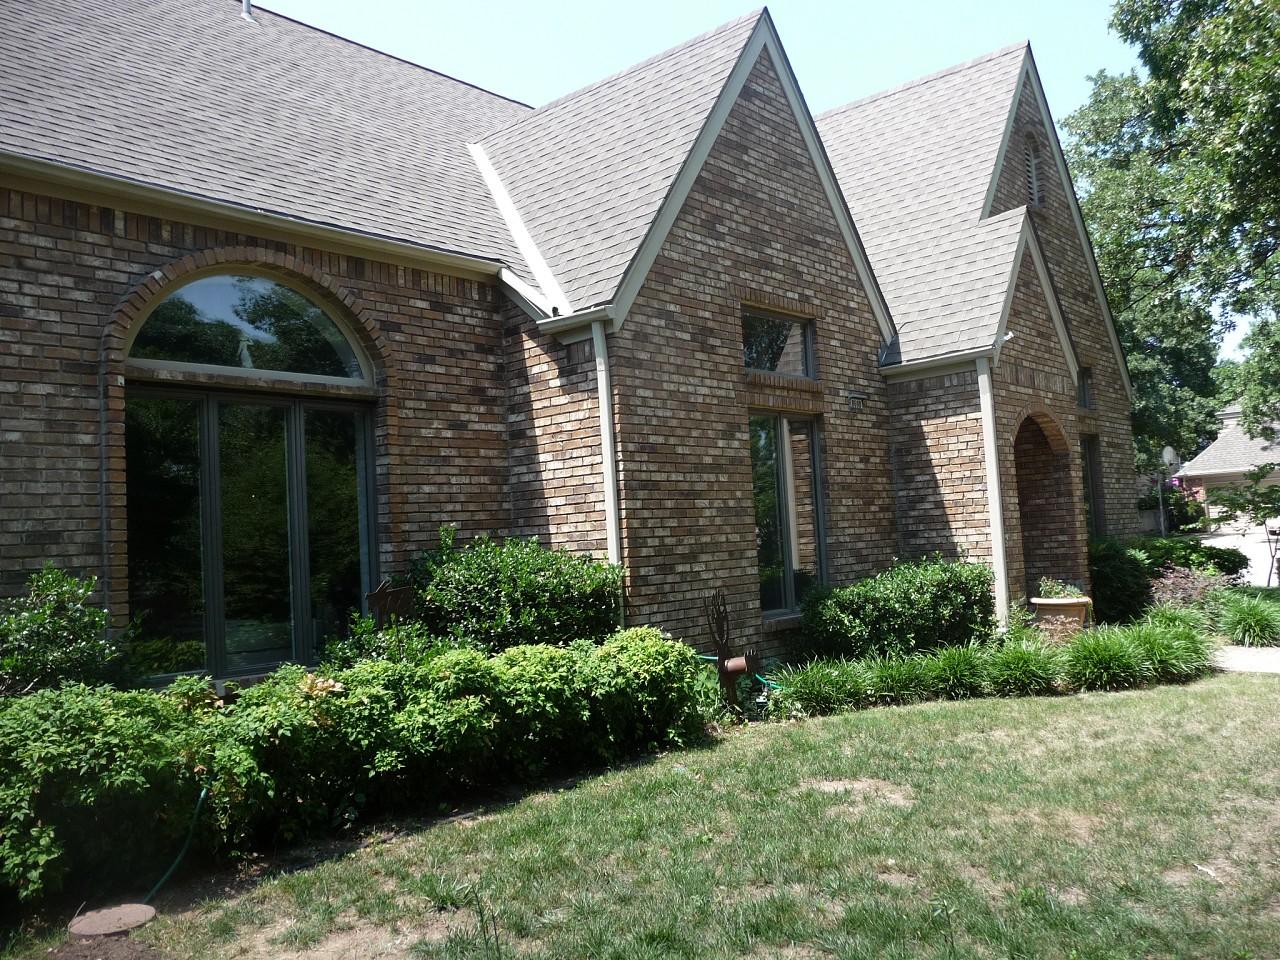 Single Family Home for Sale, ListingId:29337819, location: 8608 S Marion Avenue Tulsa 74137